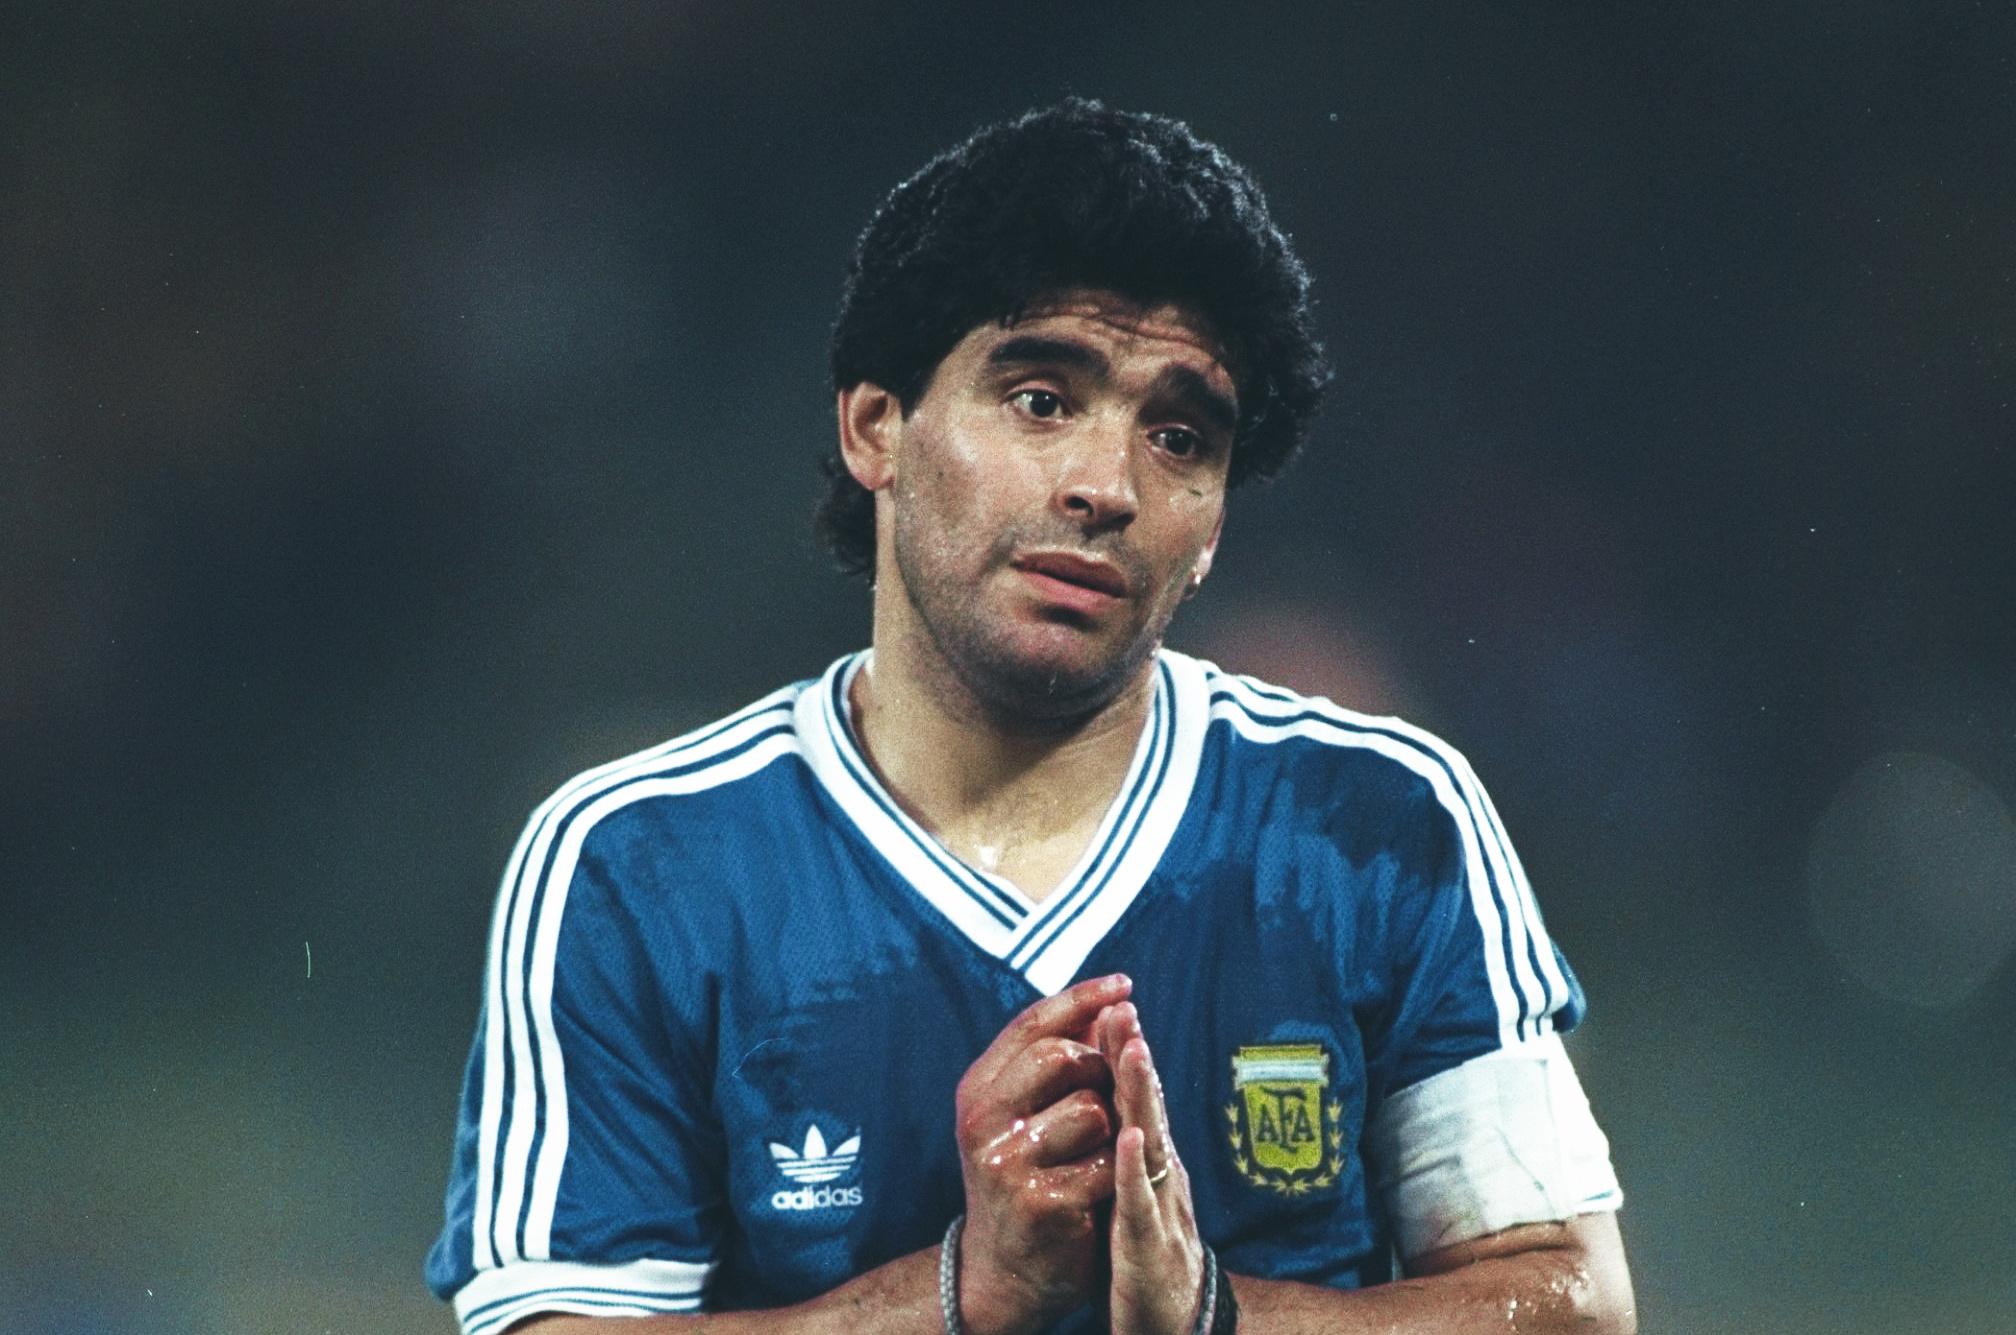 Diego Maradona At World Cup 1990 The Weeping Angel